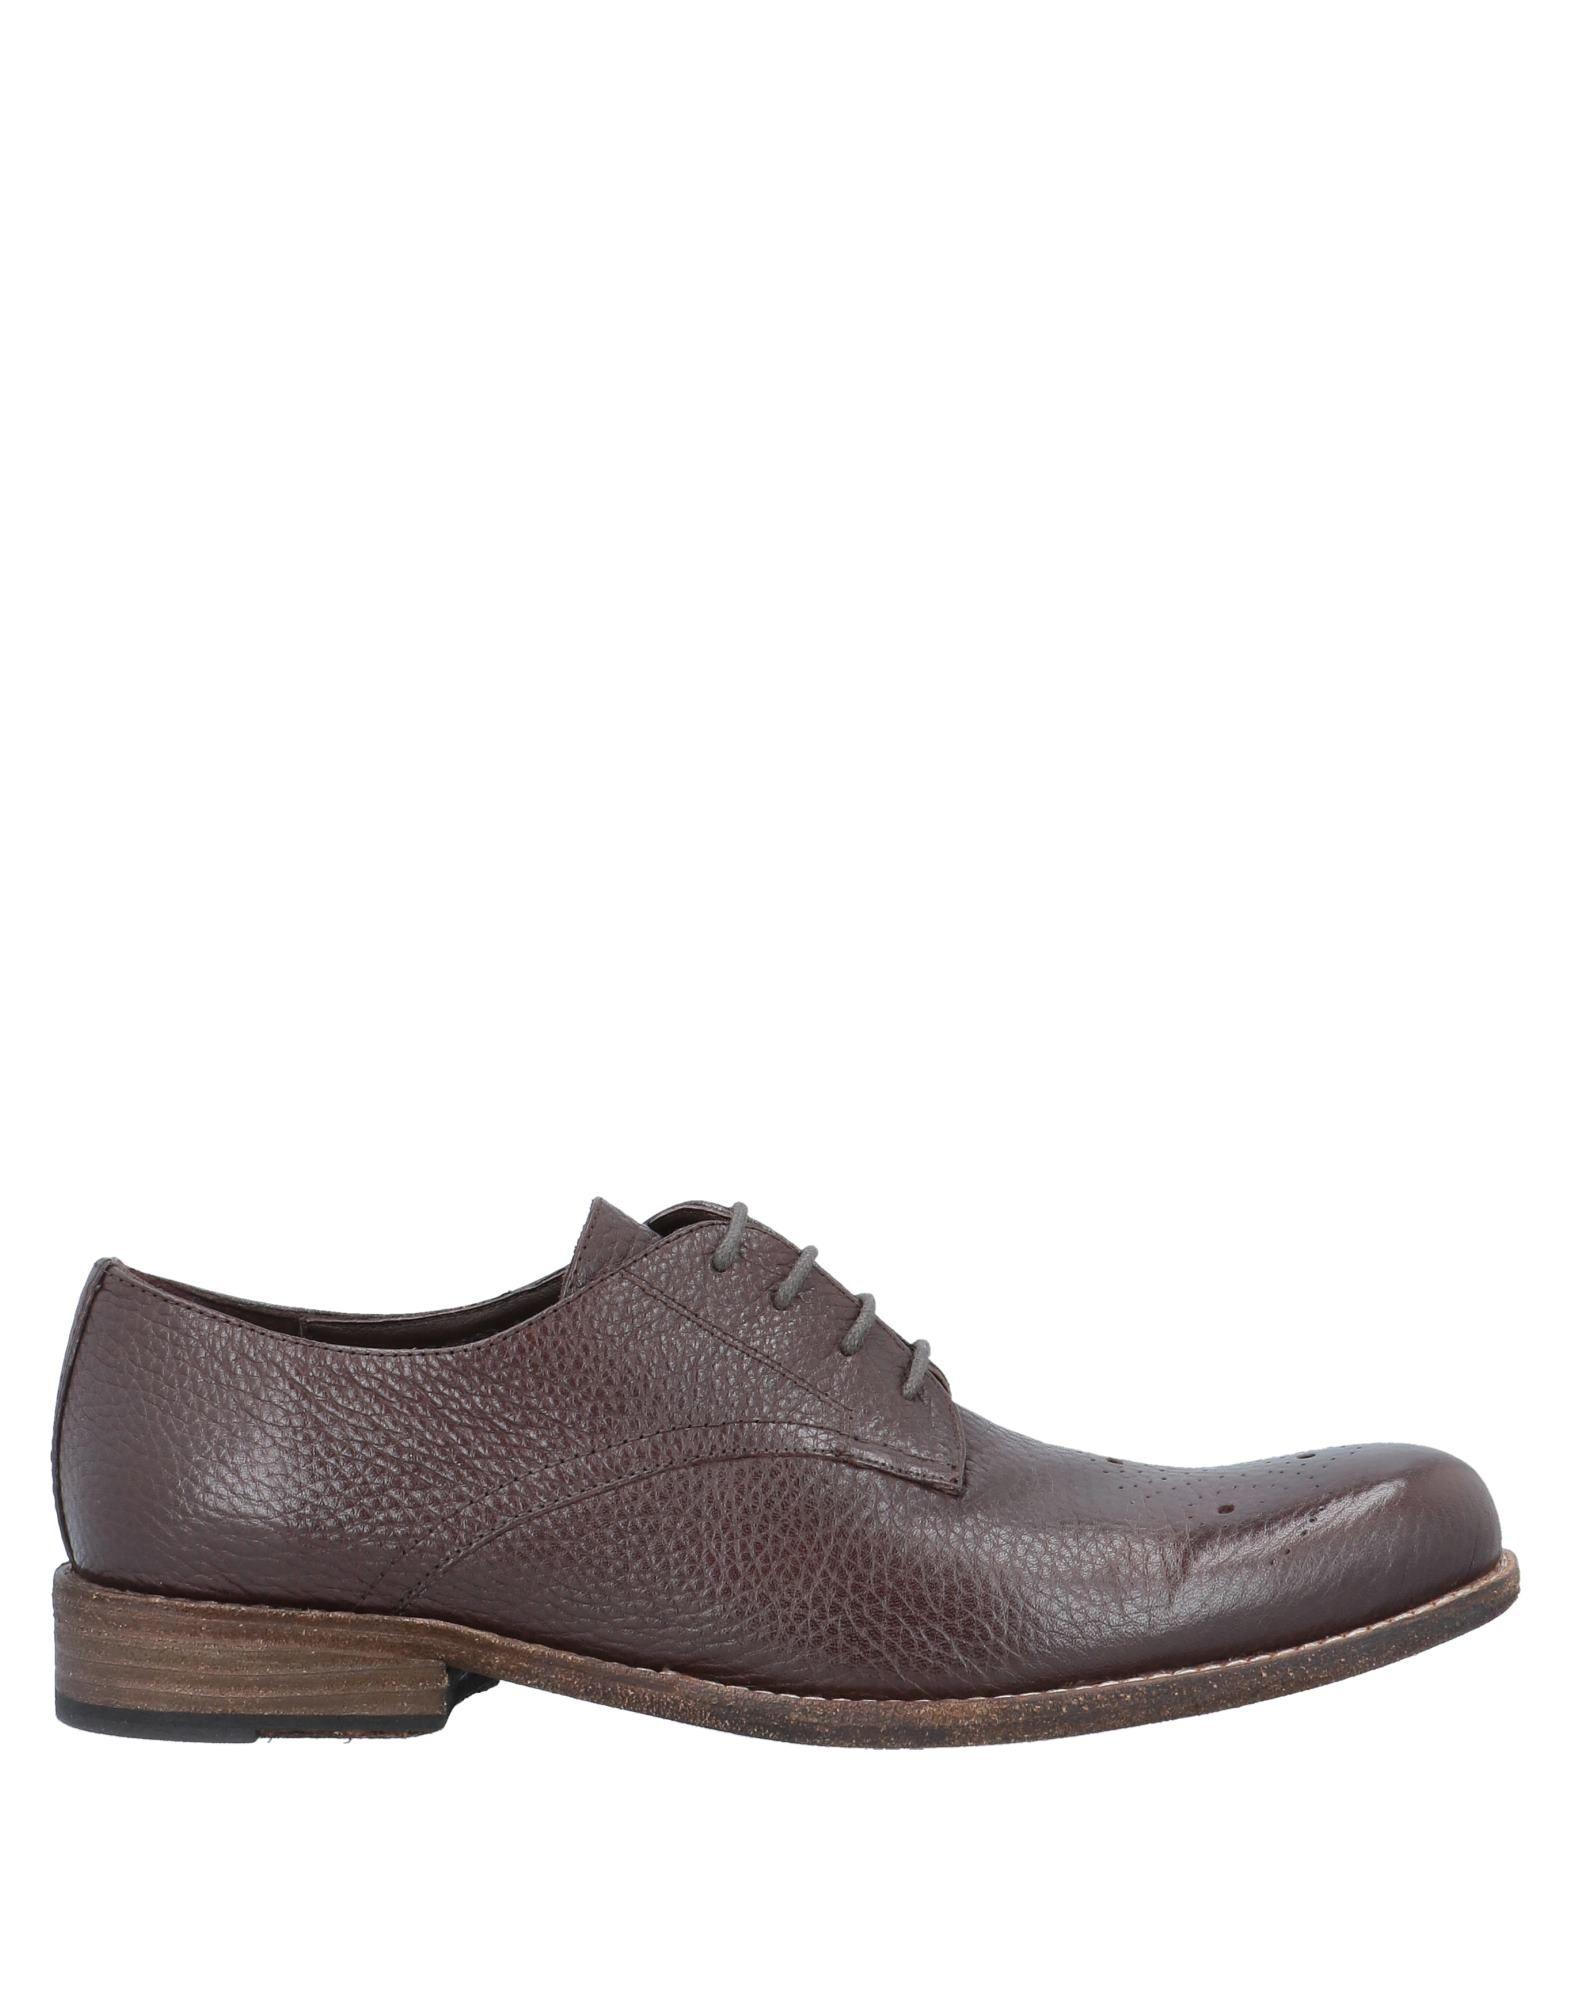 CENTO X CENTO Обувь на шнурках ateliers heschung x oamc обувь на шнурках